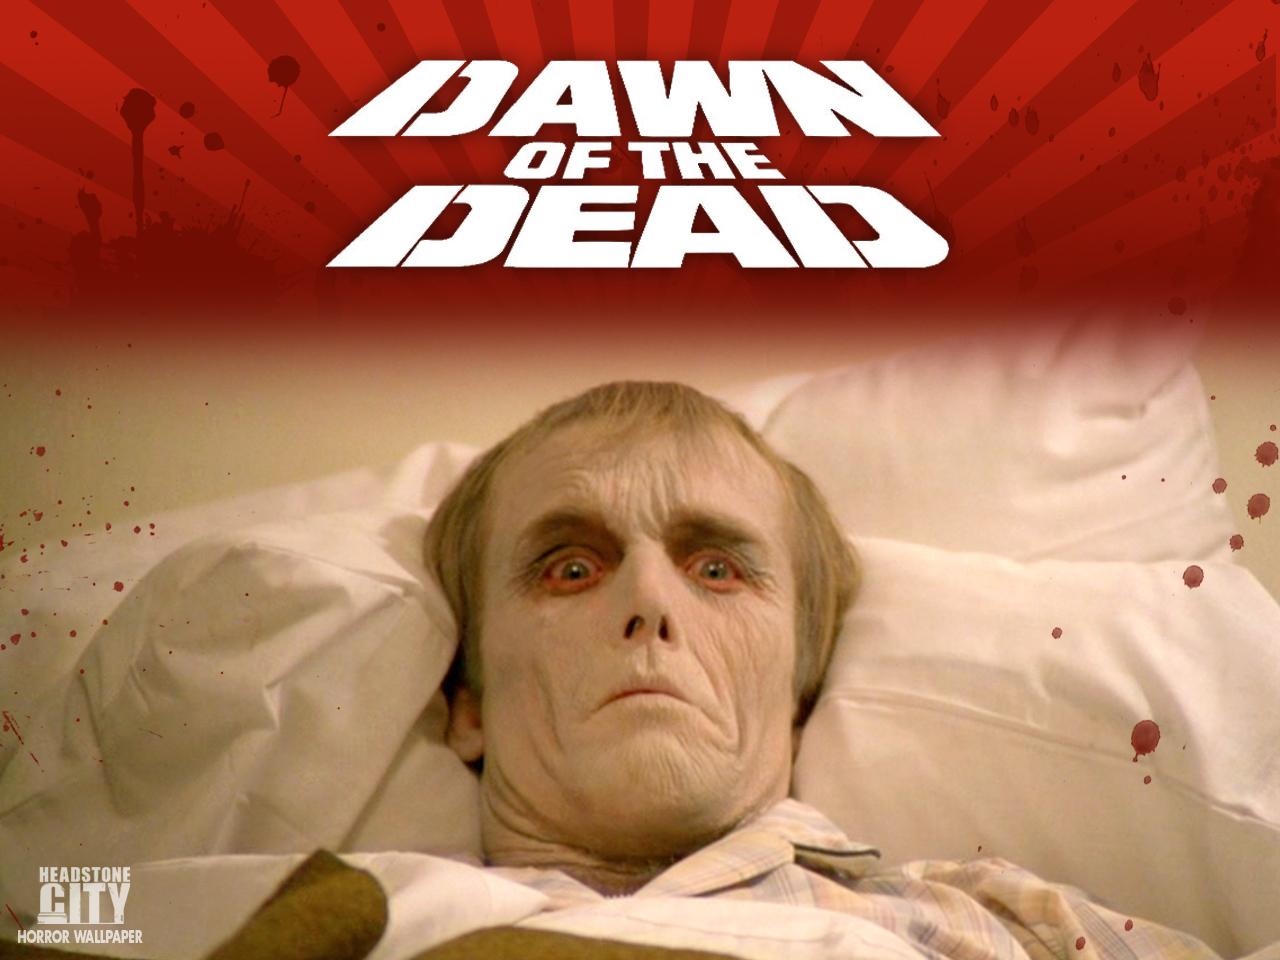 Dawn of the dead essay